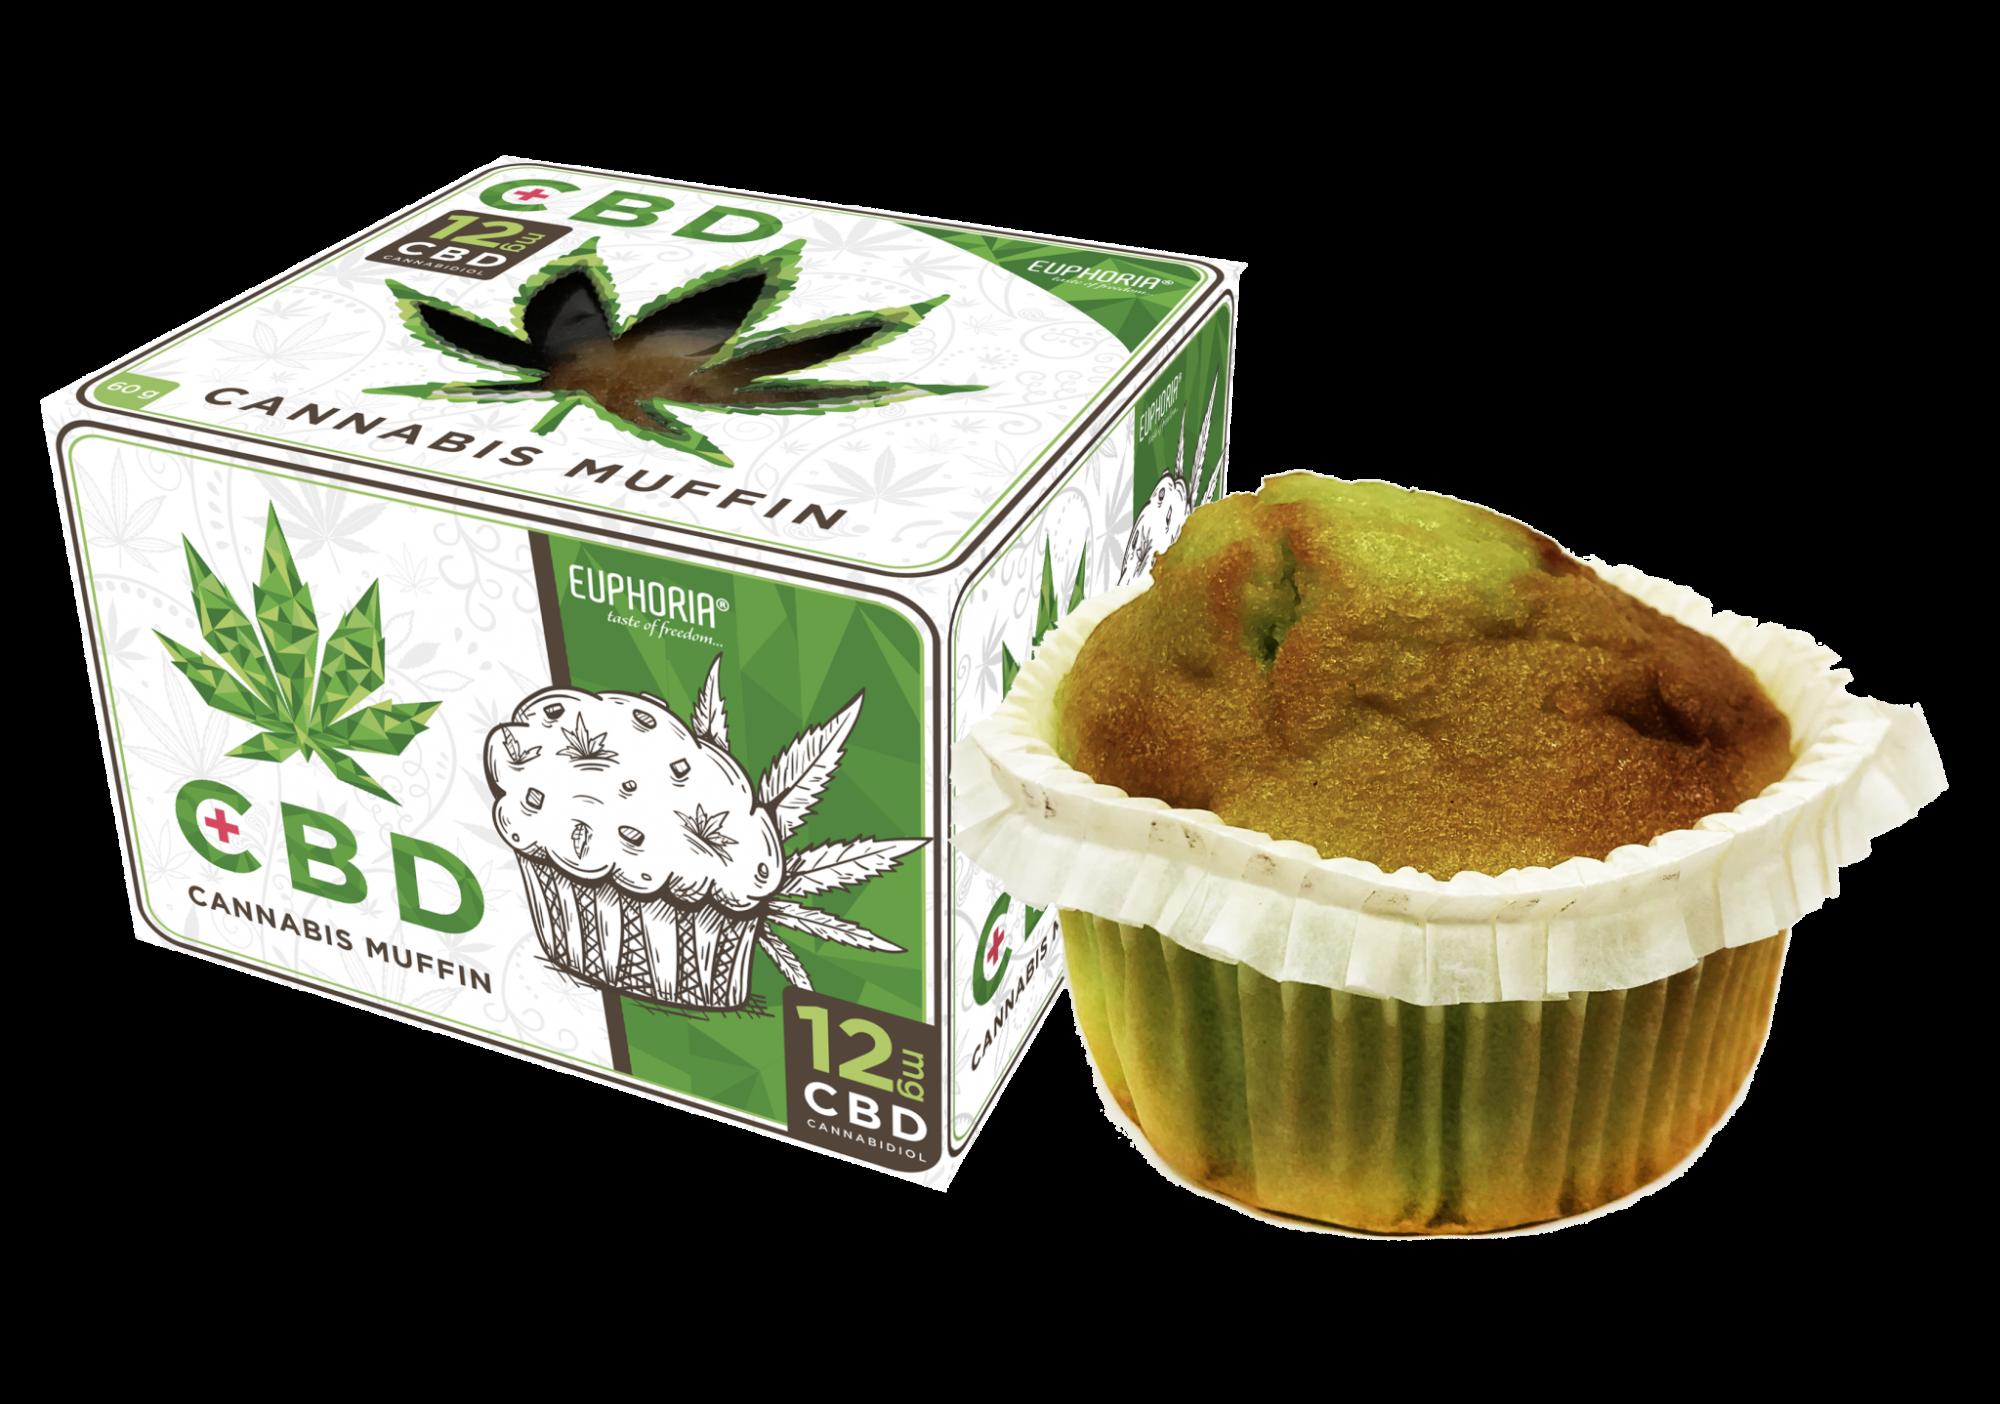 CBD Cannabis muffin with 12 mg